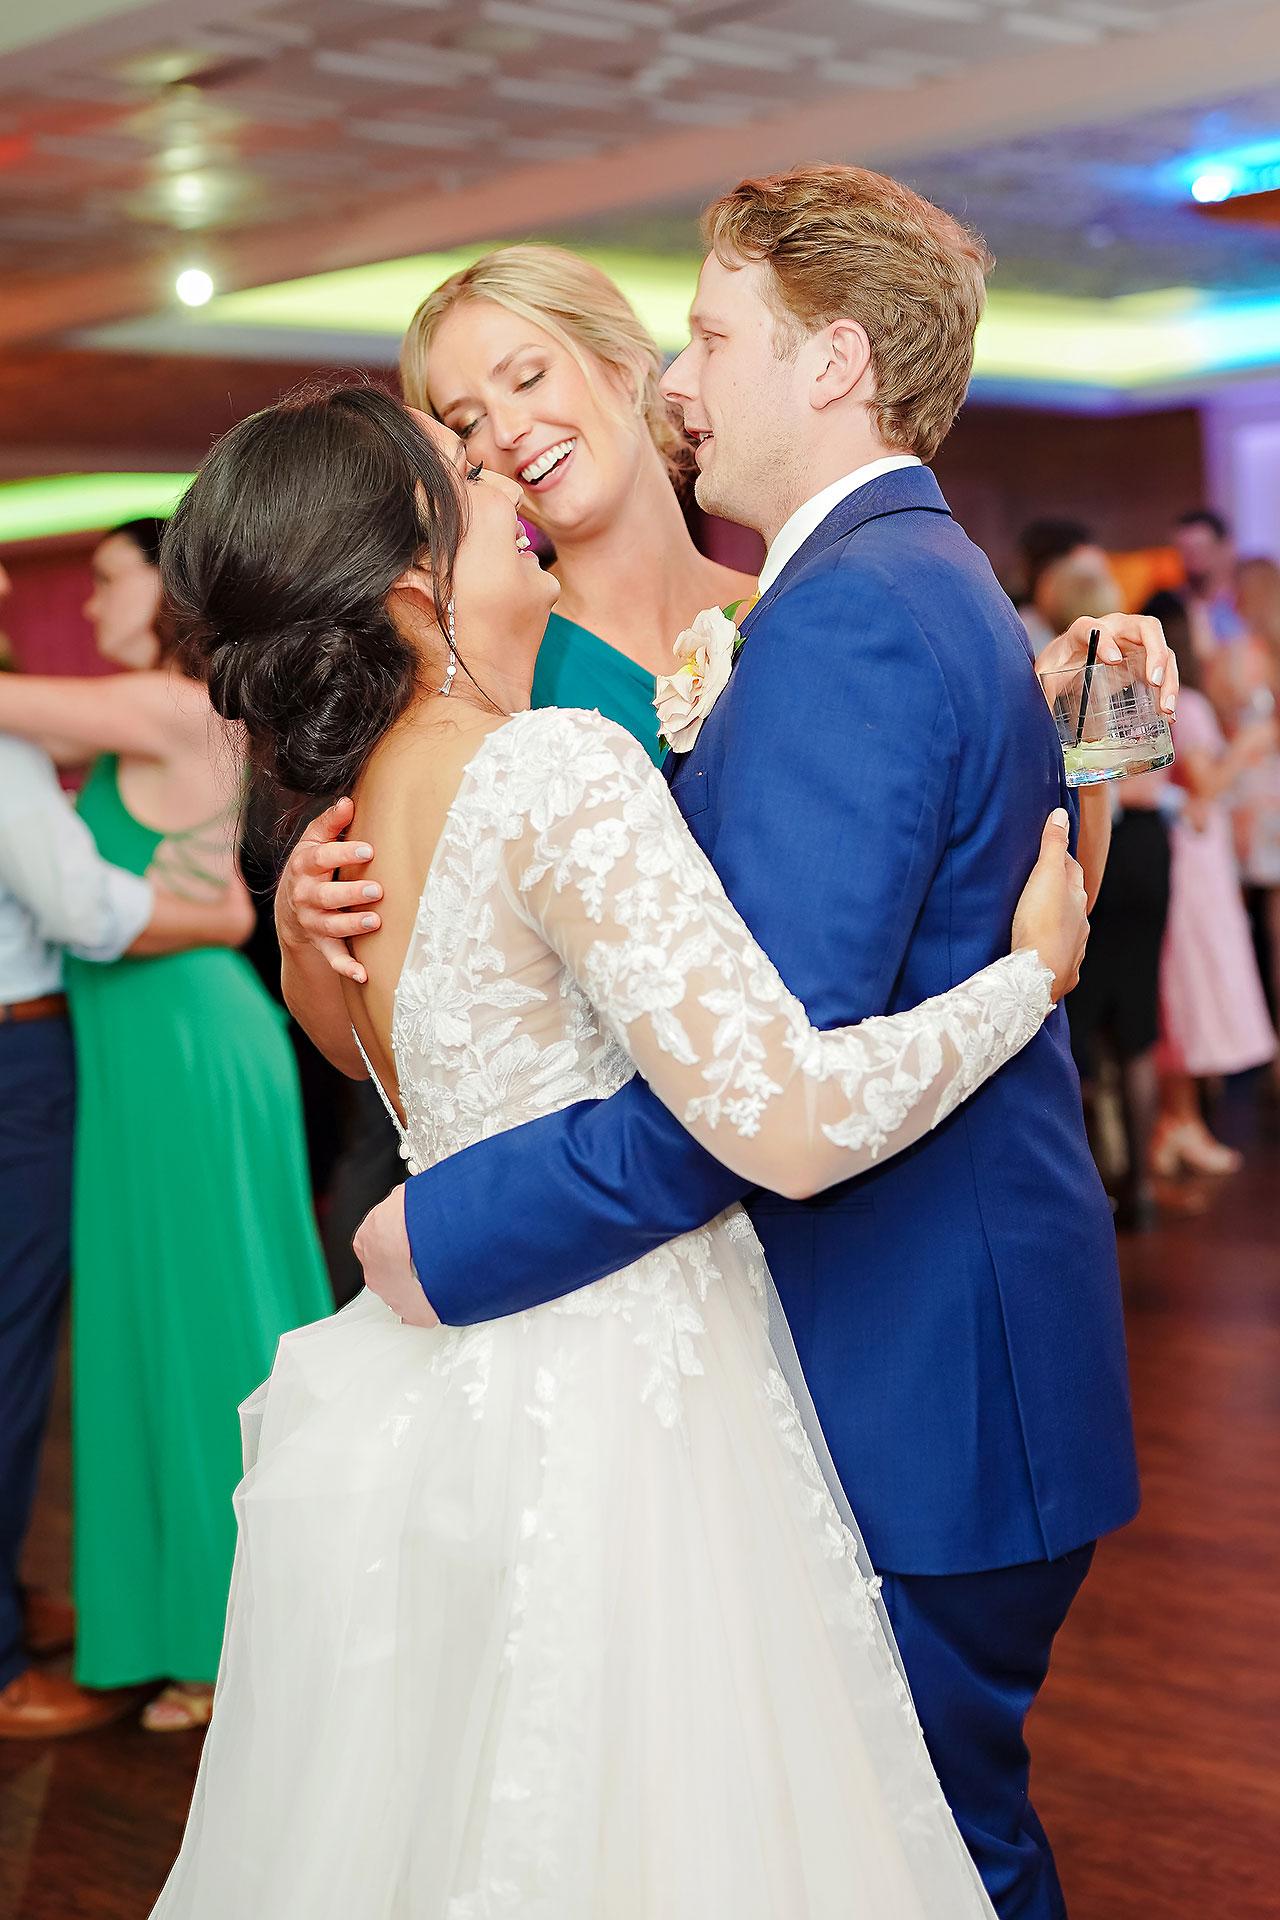 Nadia Parker Black Iris Estate Carmel Indiana Wedding May 2021 323